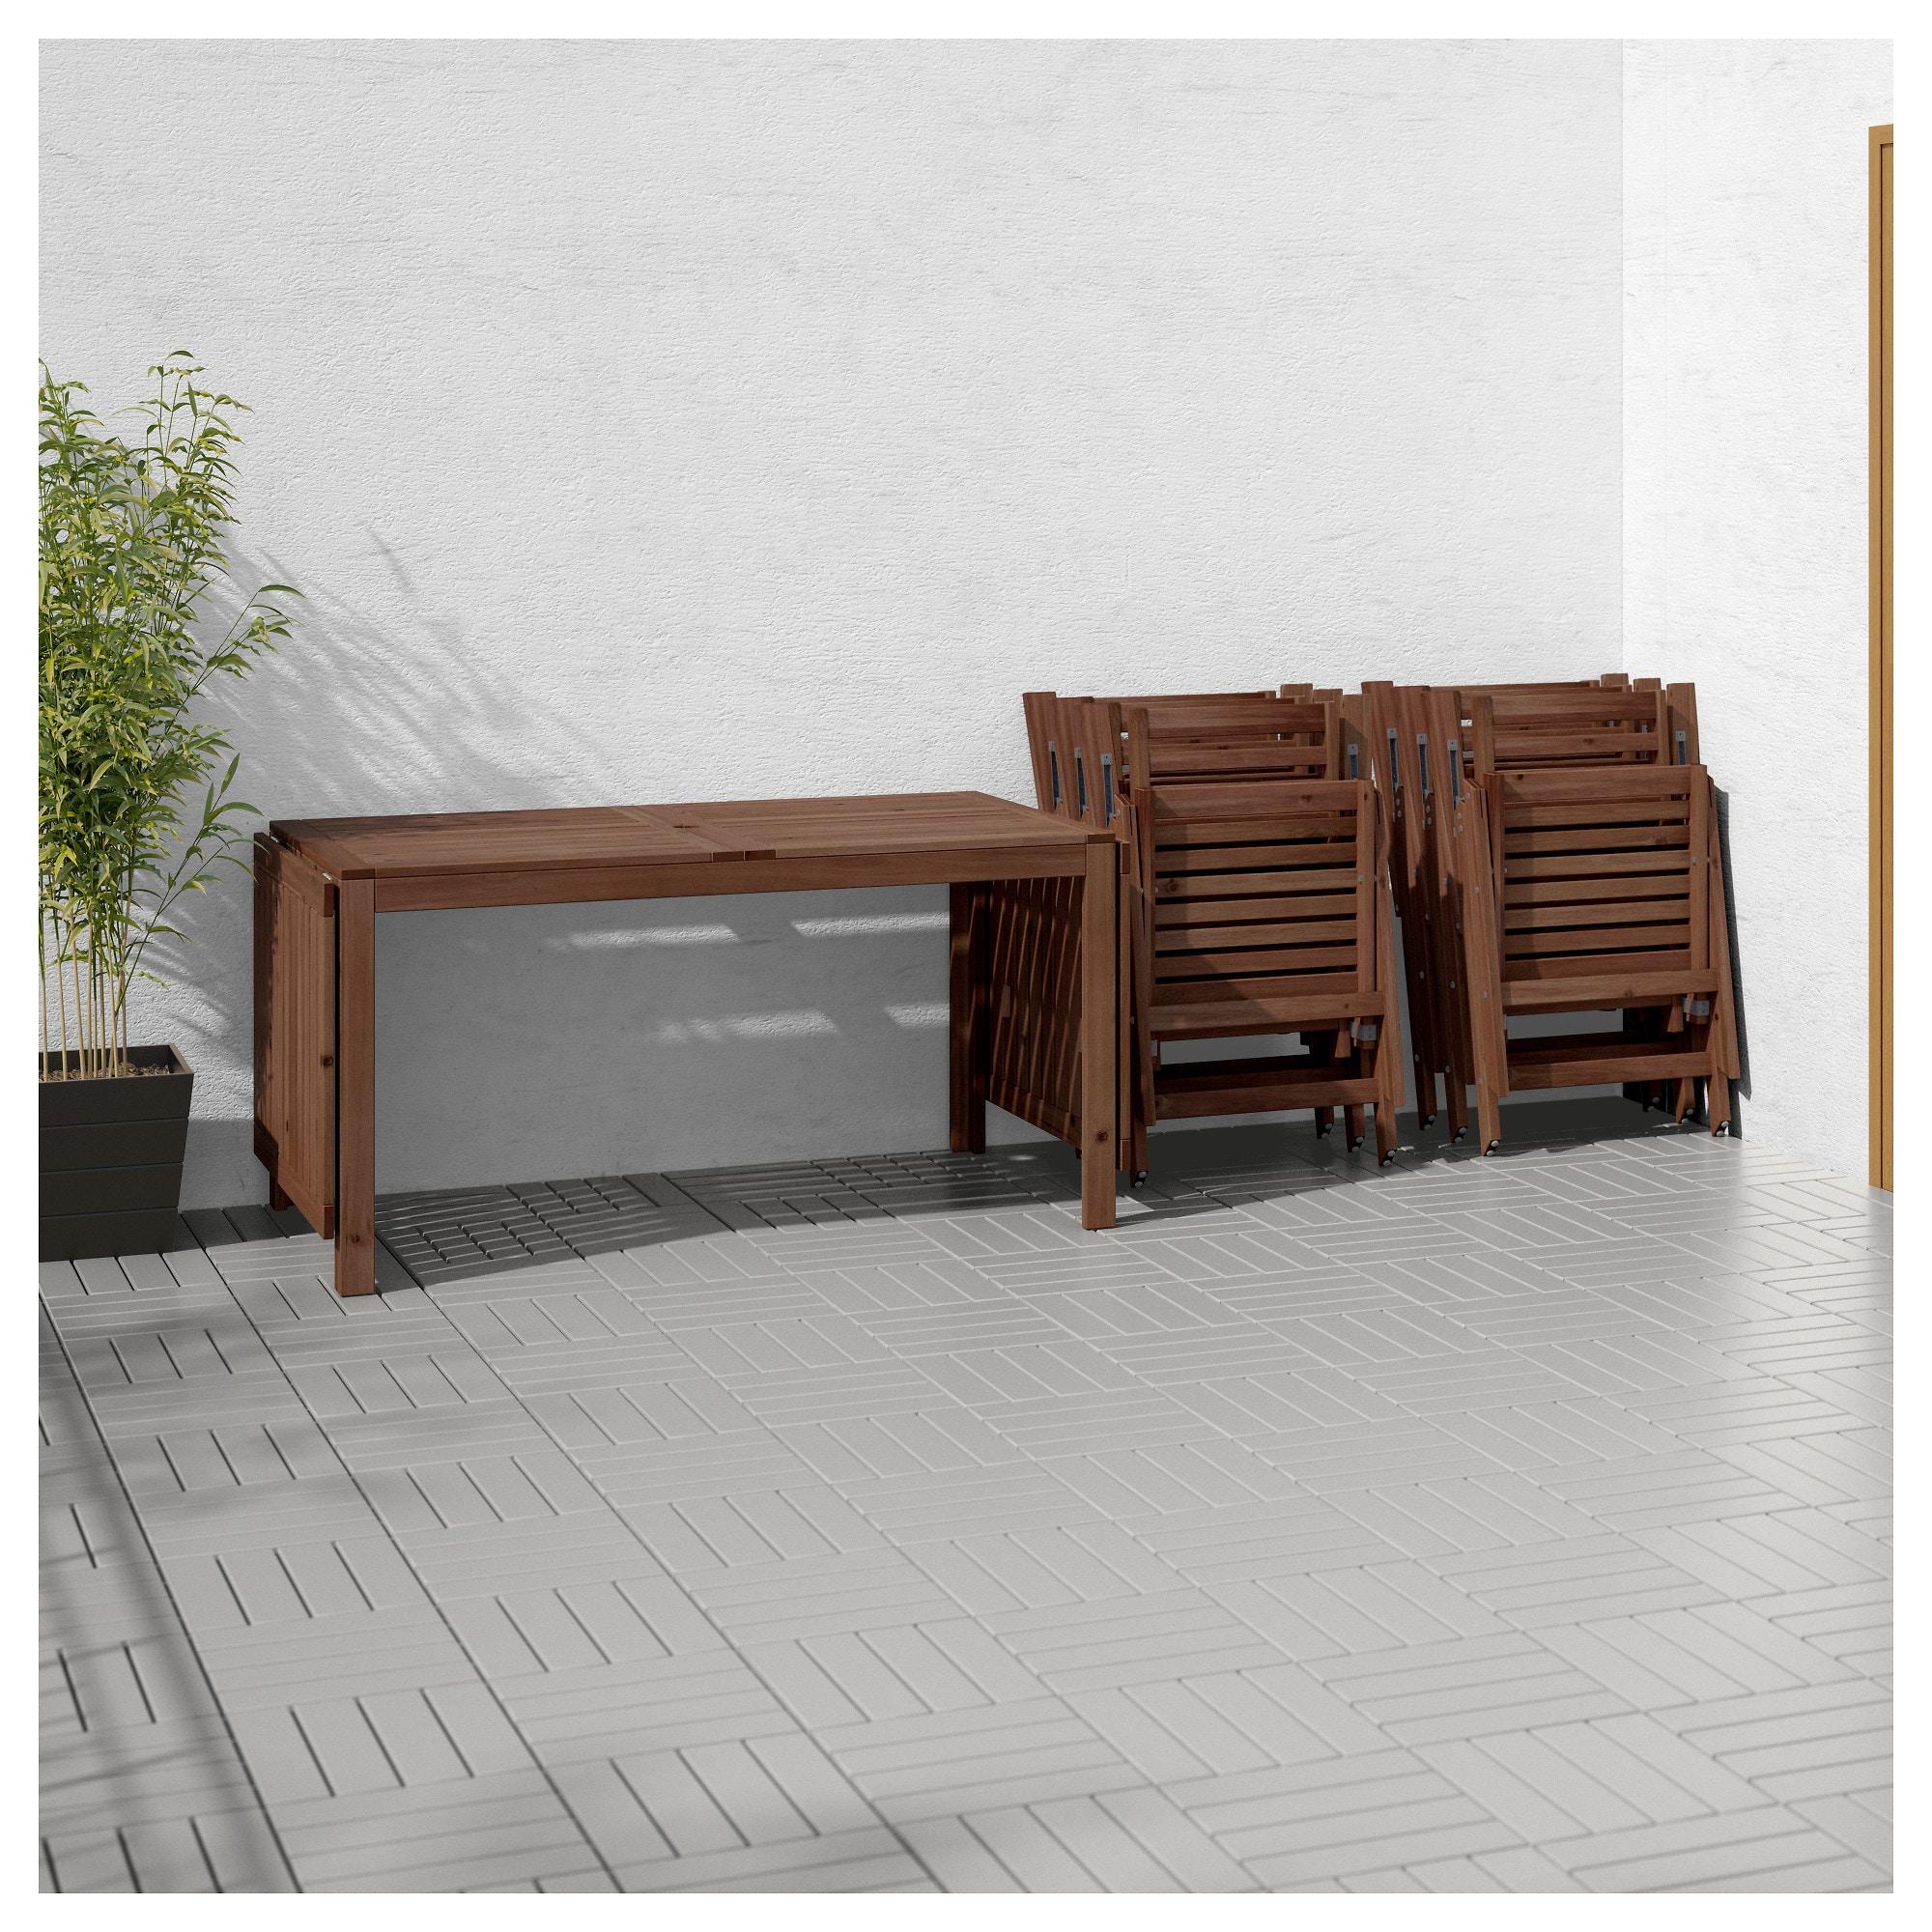 Стол, 6 кресел для сада ЭПЛАРО бежевый артикуль № 292.289.55 в наличии. Онлайн каталог IKEA РБ. Быстрая доставка и соборка.